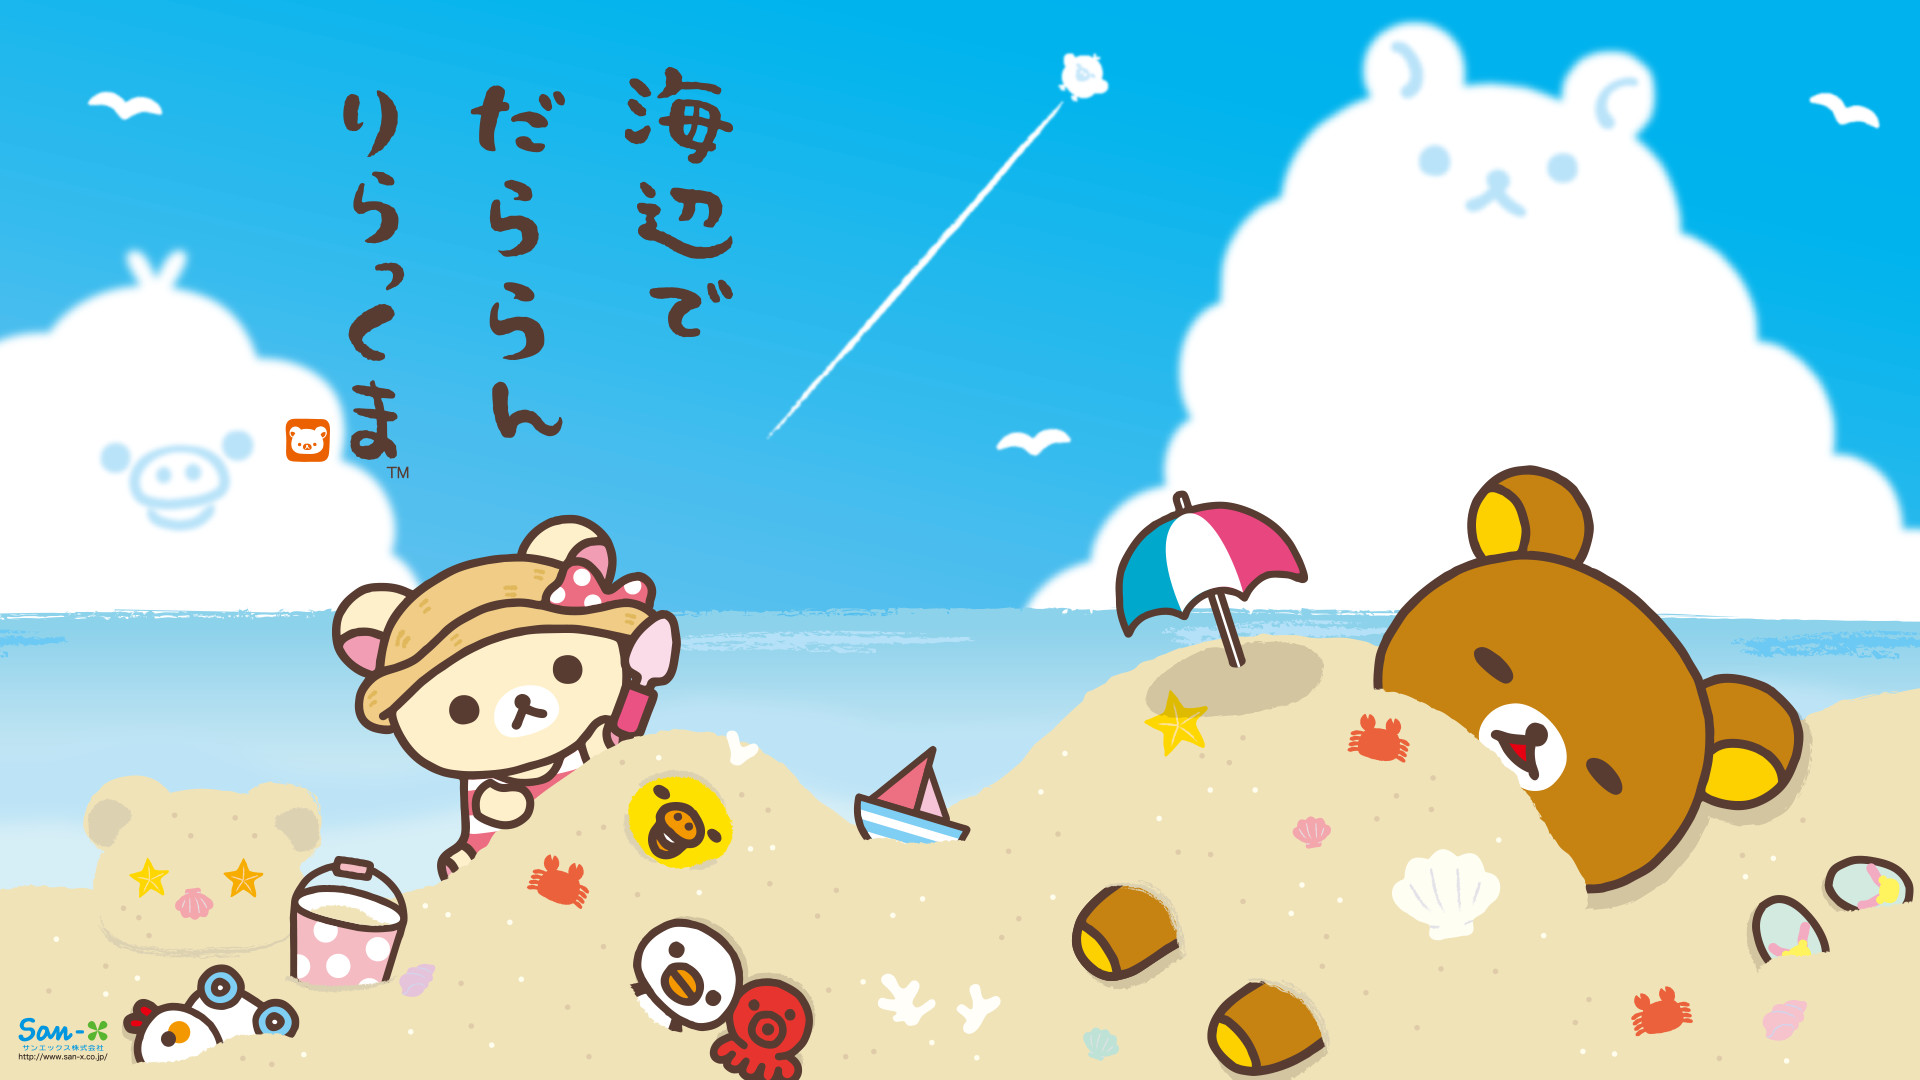 #Rilakkuma wallpaper #summer <3 sand & sun ^^   Rilakkuma <3 <3   Pinterest    Rilakkuma, Rilakkuma wallpaper and Kawaii